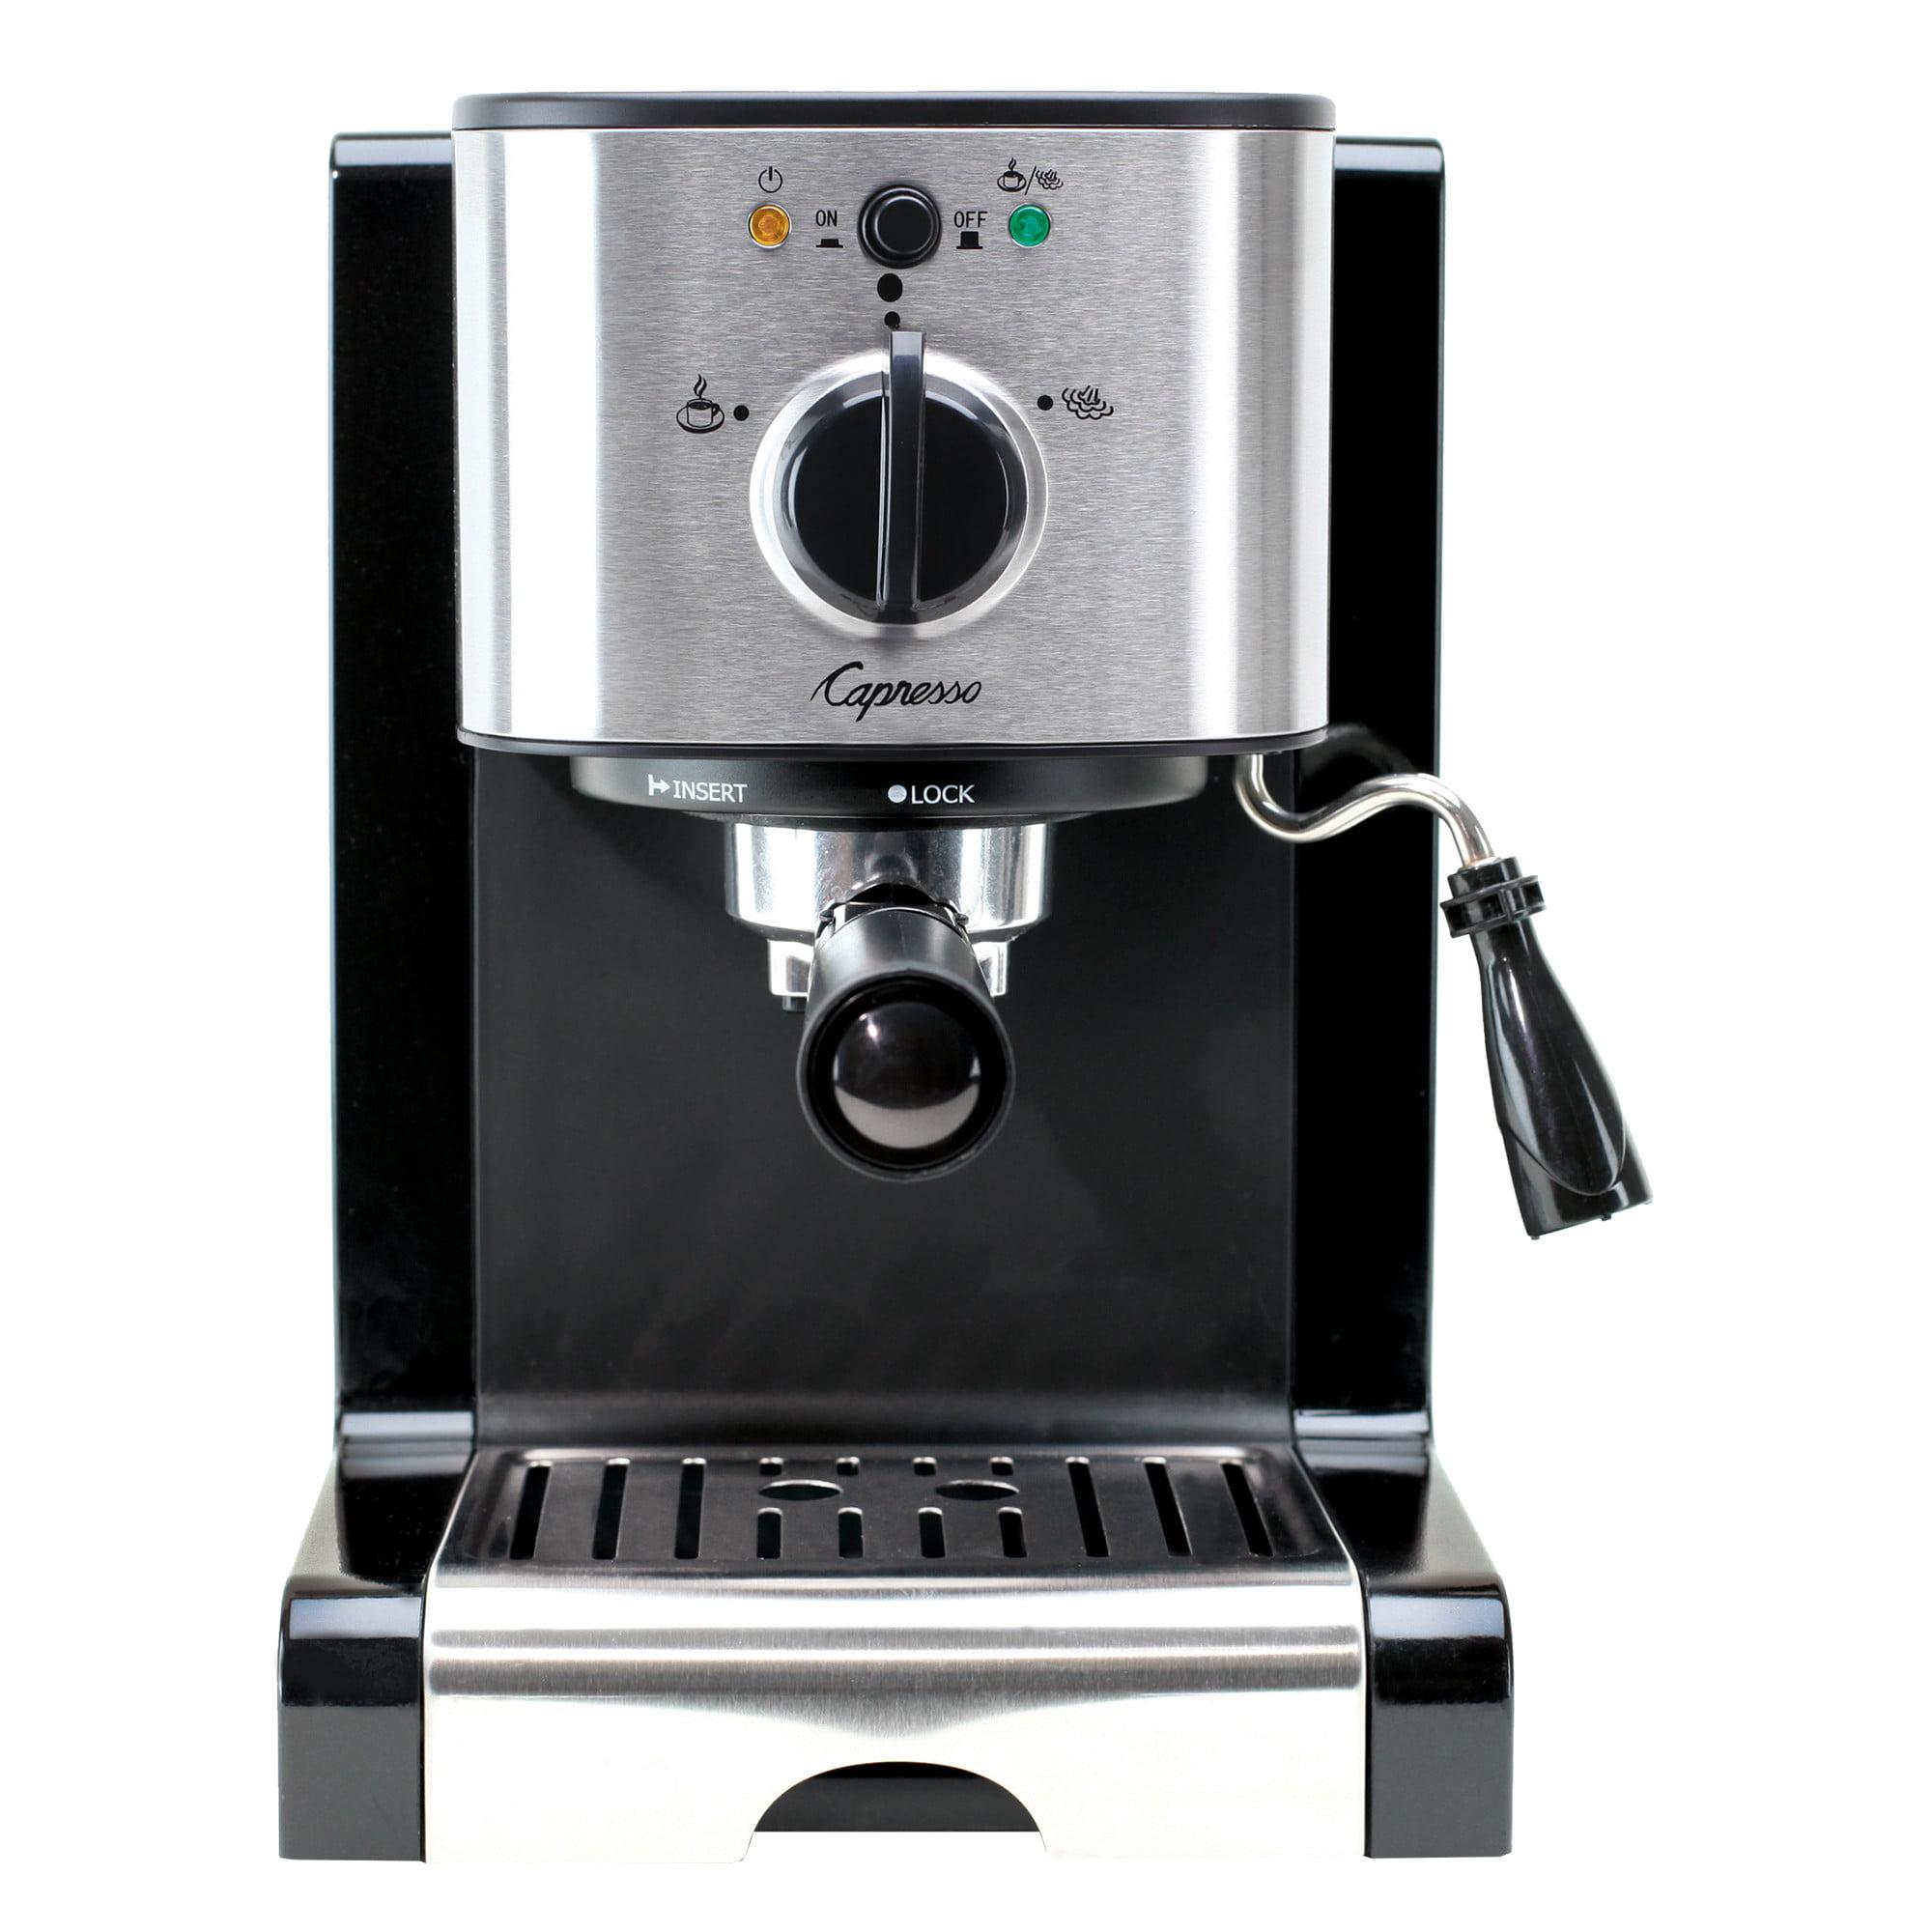 Capresso EC100 Espresso Machine by